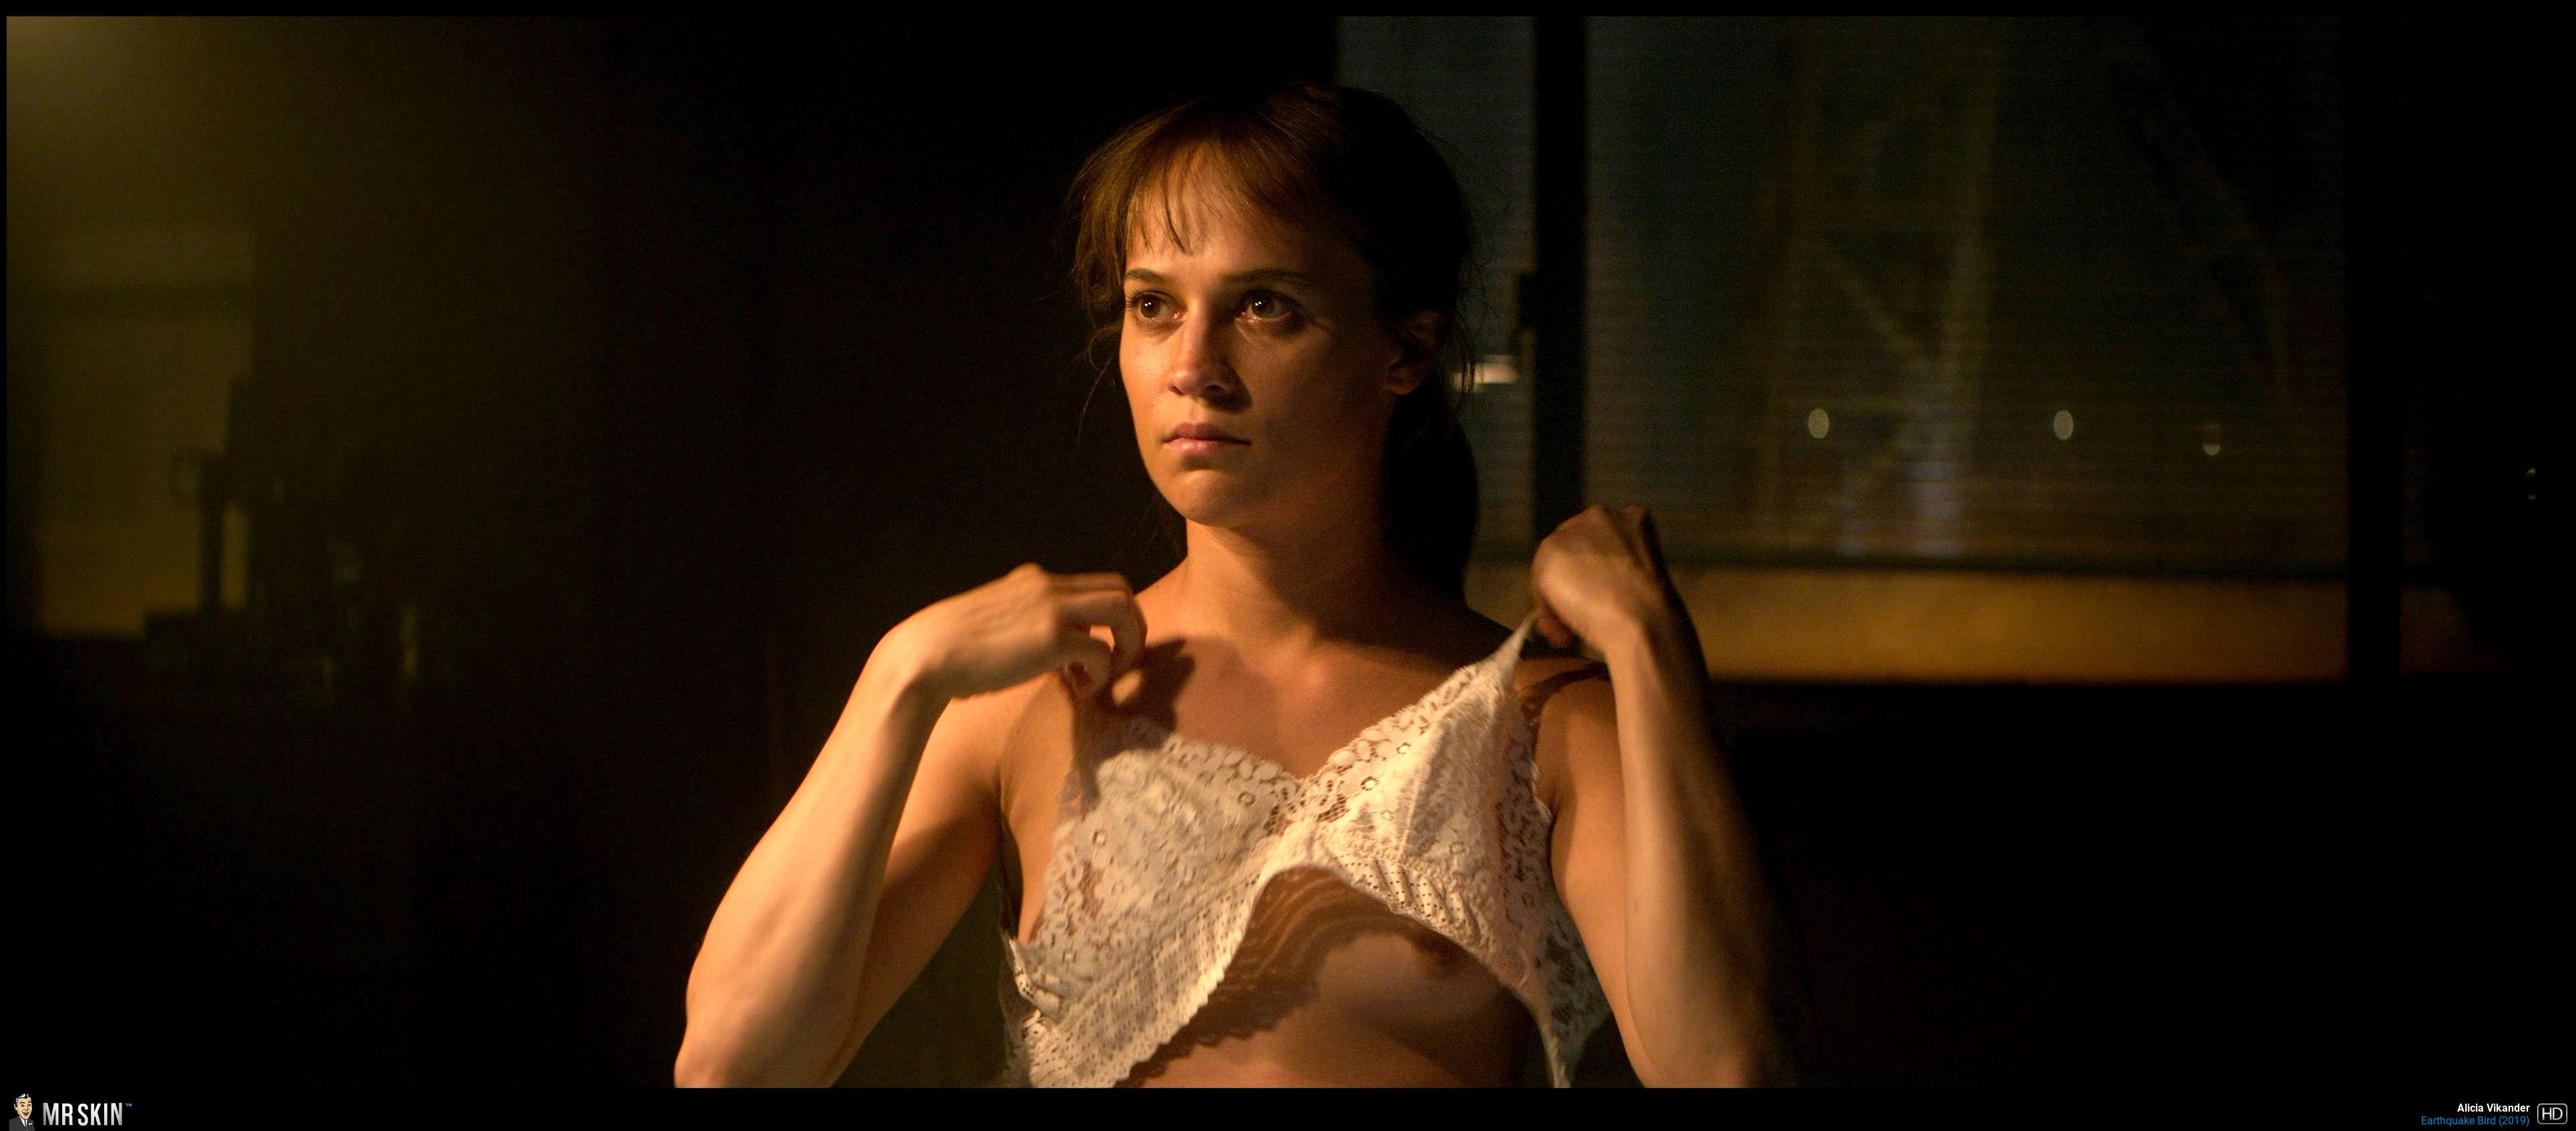 Alicia_Vikander's Porn alicia vikander goes nude yet again